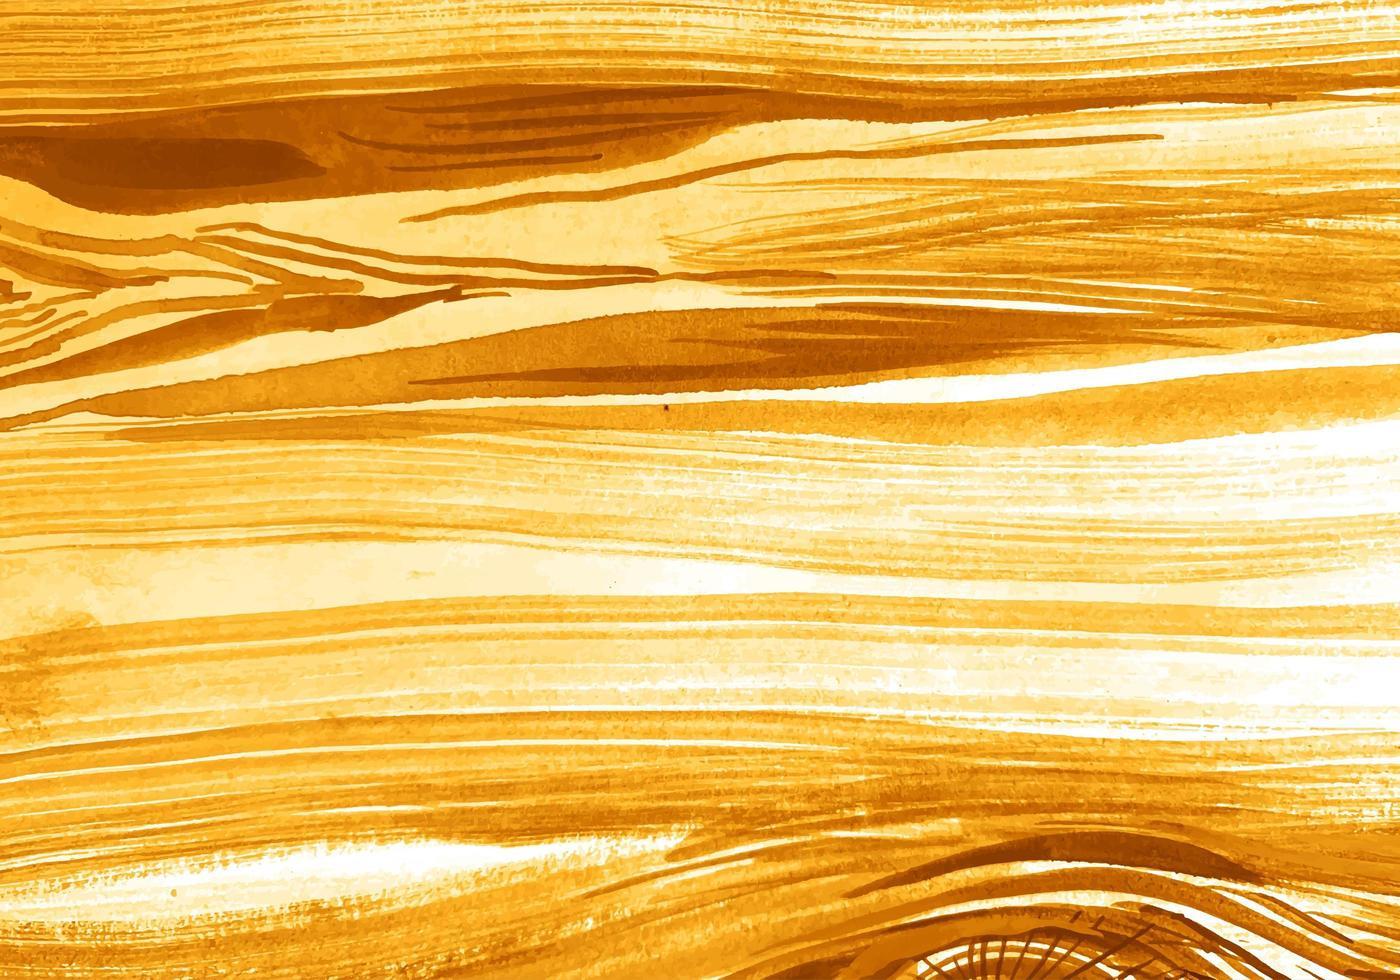 tan Holz Textur Hintergrund vektor